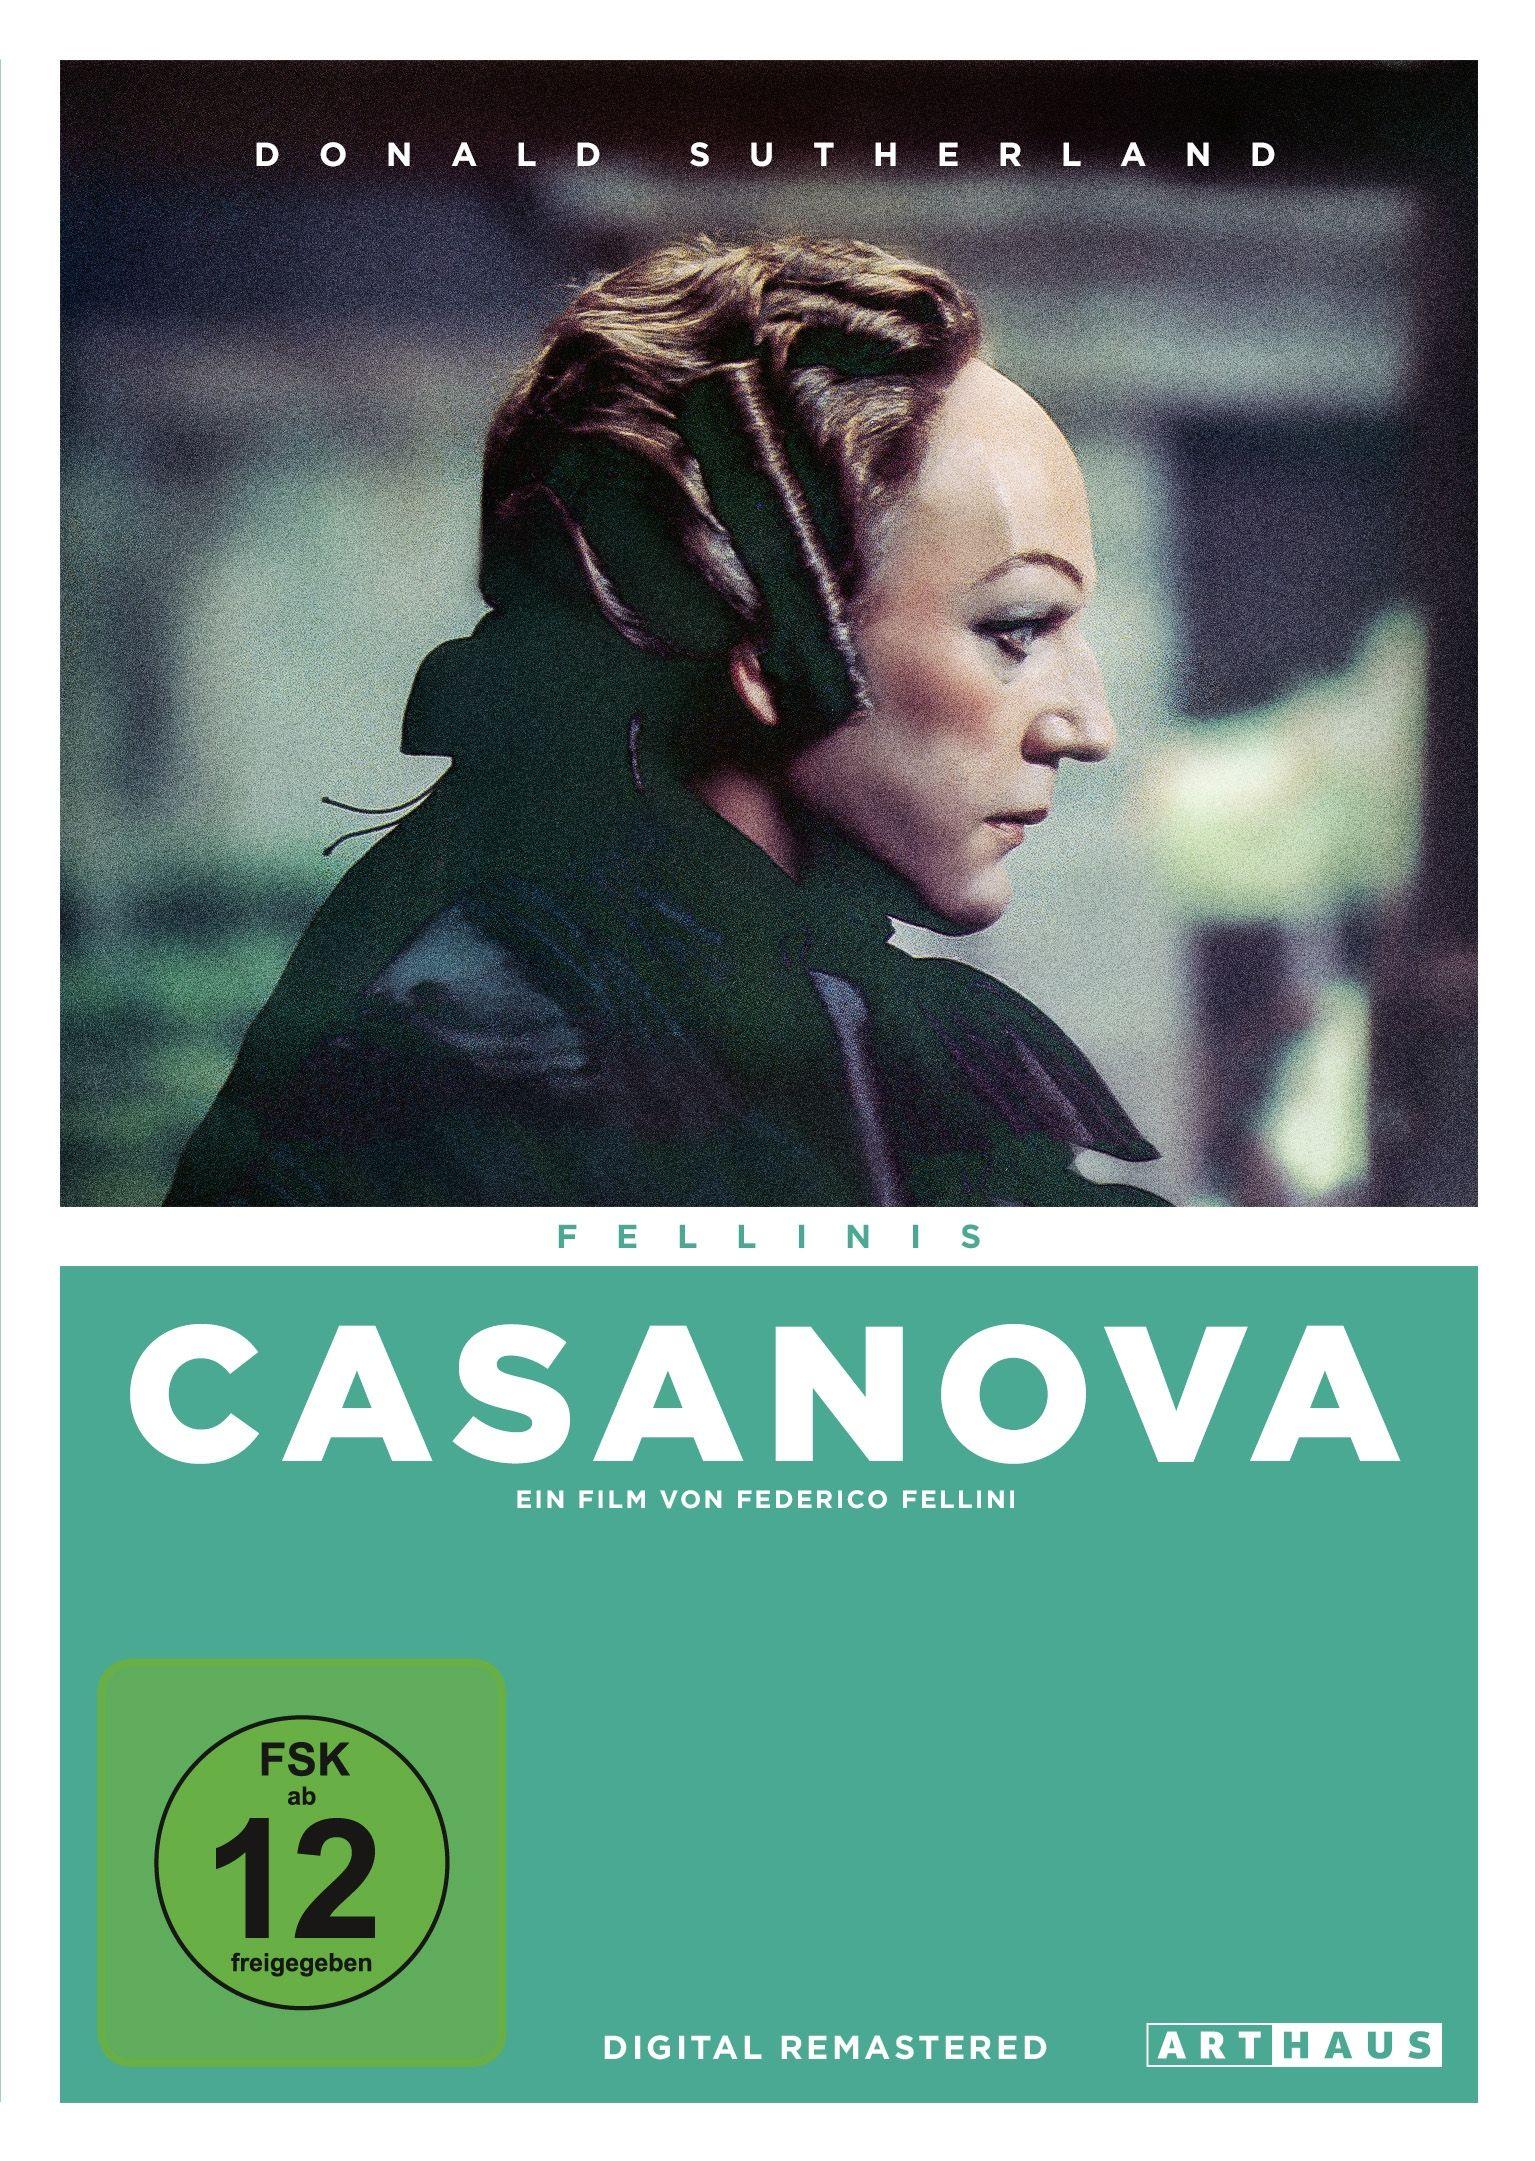 Fellinis Casanova (Digital Remastered)